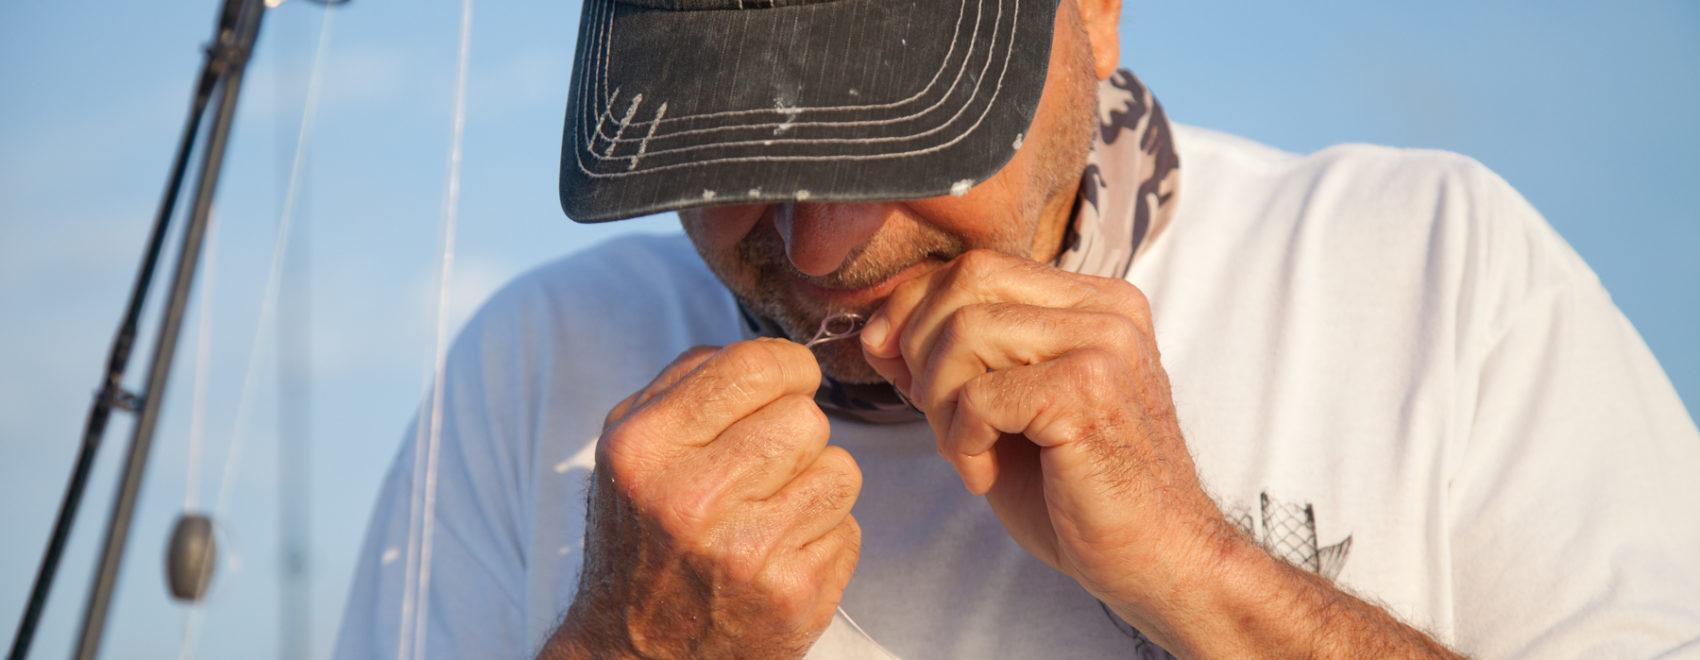 World Record Holder Angler and Fishing Guide Mark Cockerham